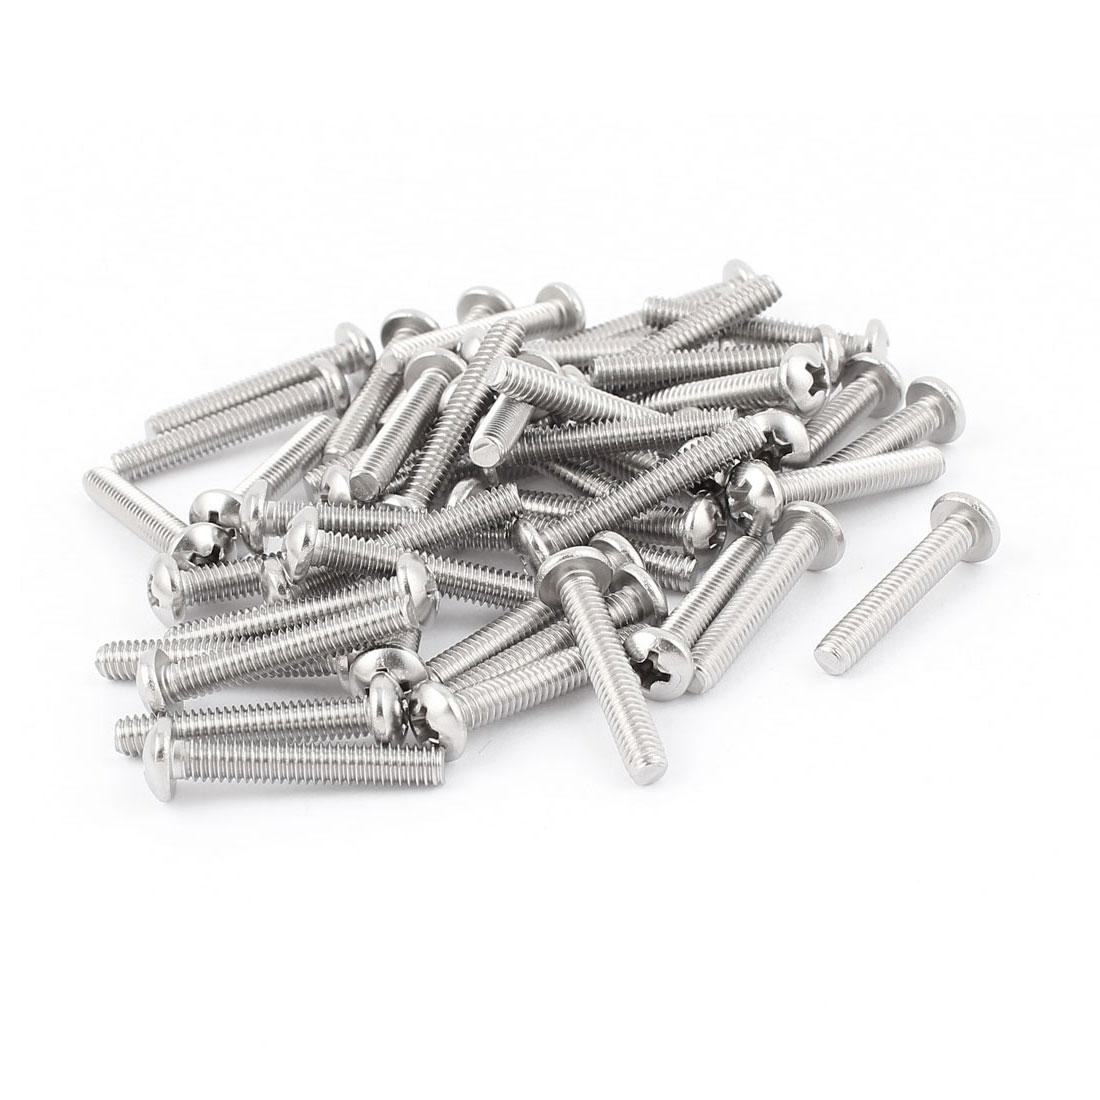 "50 Pcs #6-32 x 5/8"" Stainless Steel Phillips Truss Head Machine Screws 18mm Long"